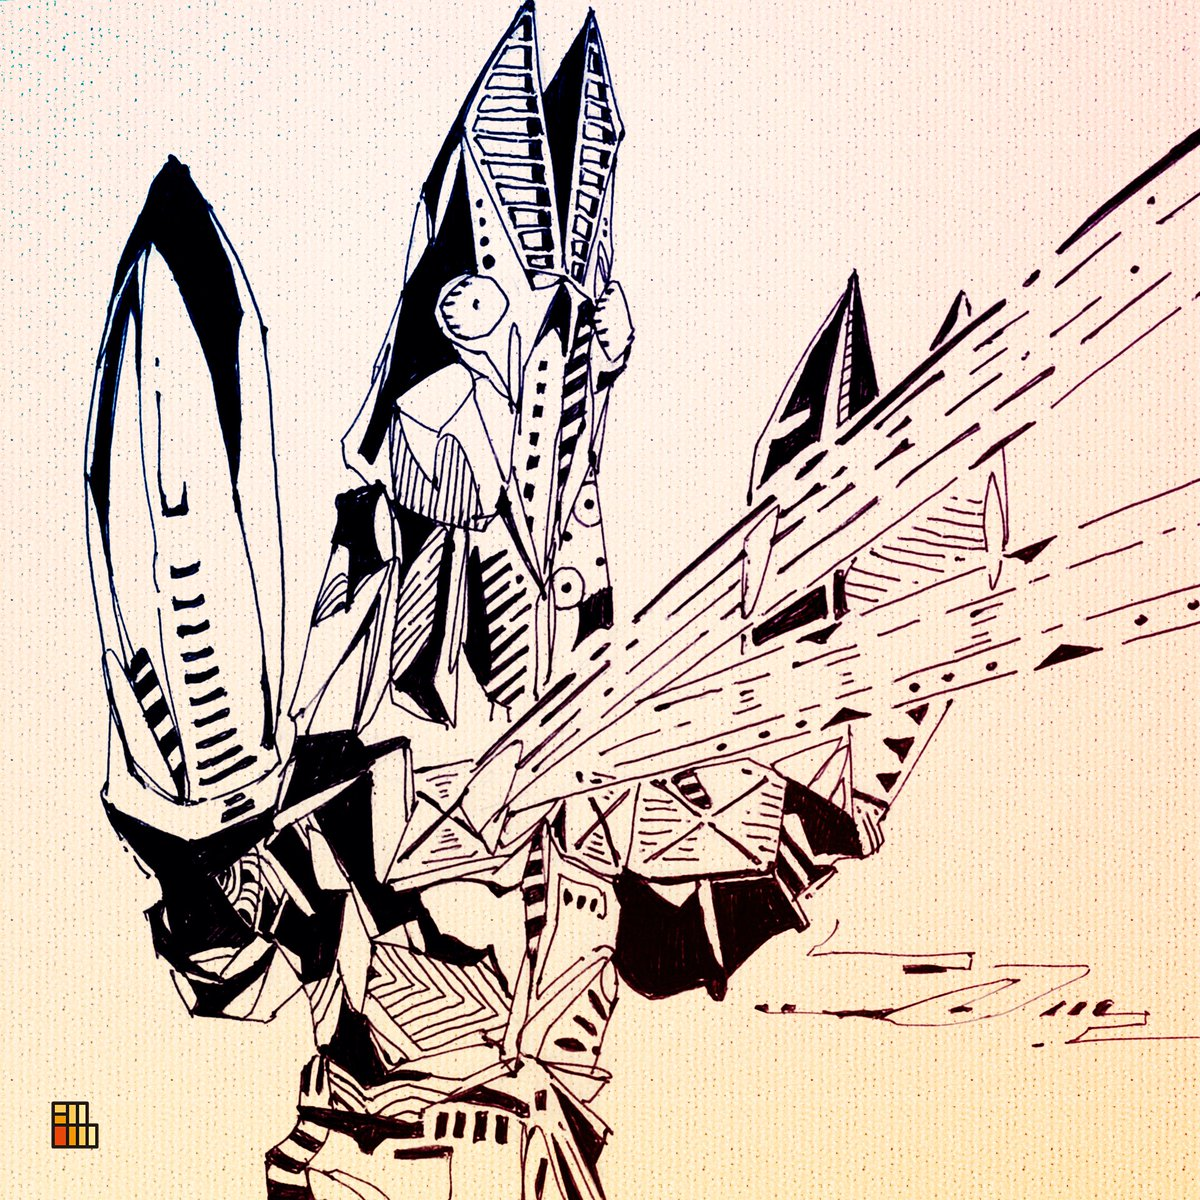 #drawing #ballpen #ballpendrawing  #zentangle #patterndesign #ultraman #alienbaltan #ultramanfanart  #illustration #illust #photoshop #kaiju #ボールペンイラスト #ボールペン画 #ゼンタングル #バルタン星人 #バルタン星人二代目 #ウルトラマン #ウルトラ怪獣 #ウルトラマンの怪獣全部描く https://t.co/gH3udcAOQb